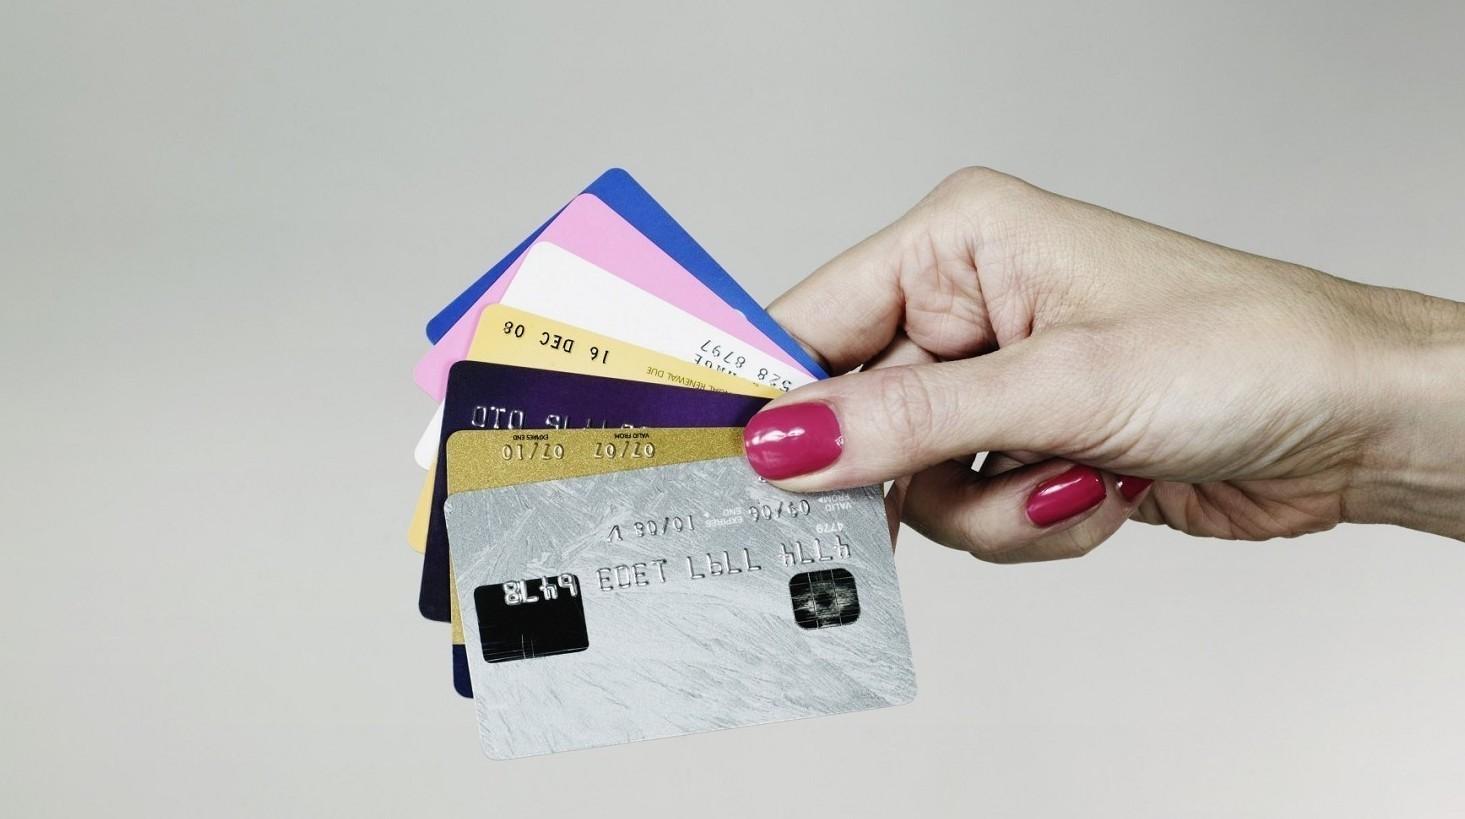 Carte prepagate: perché scegliere una carta ricaricabile